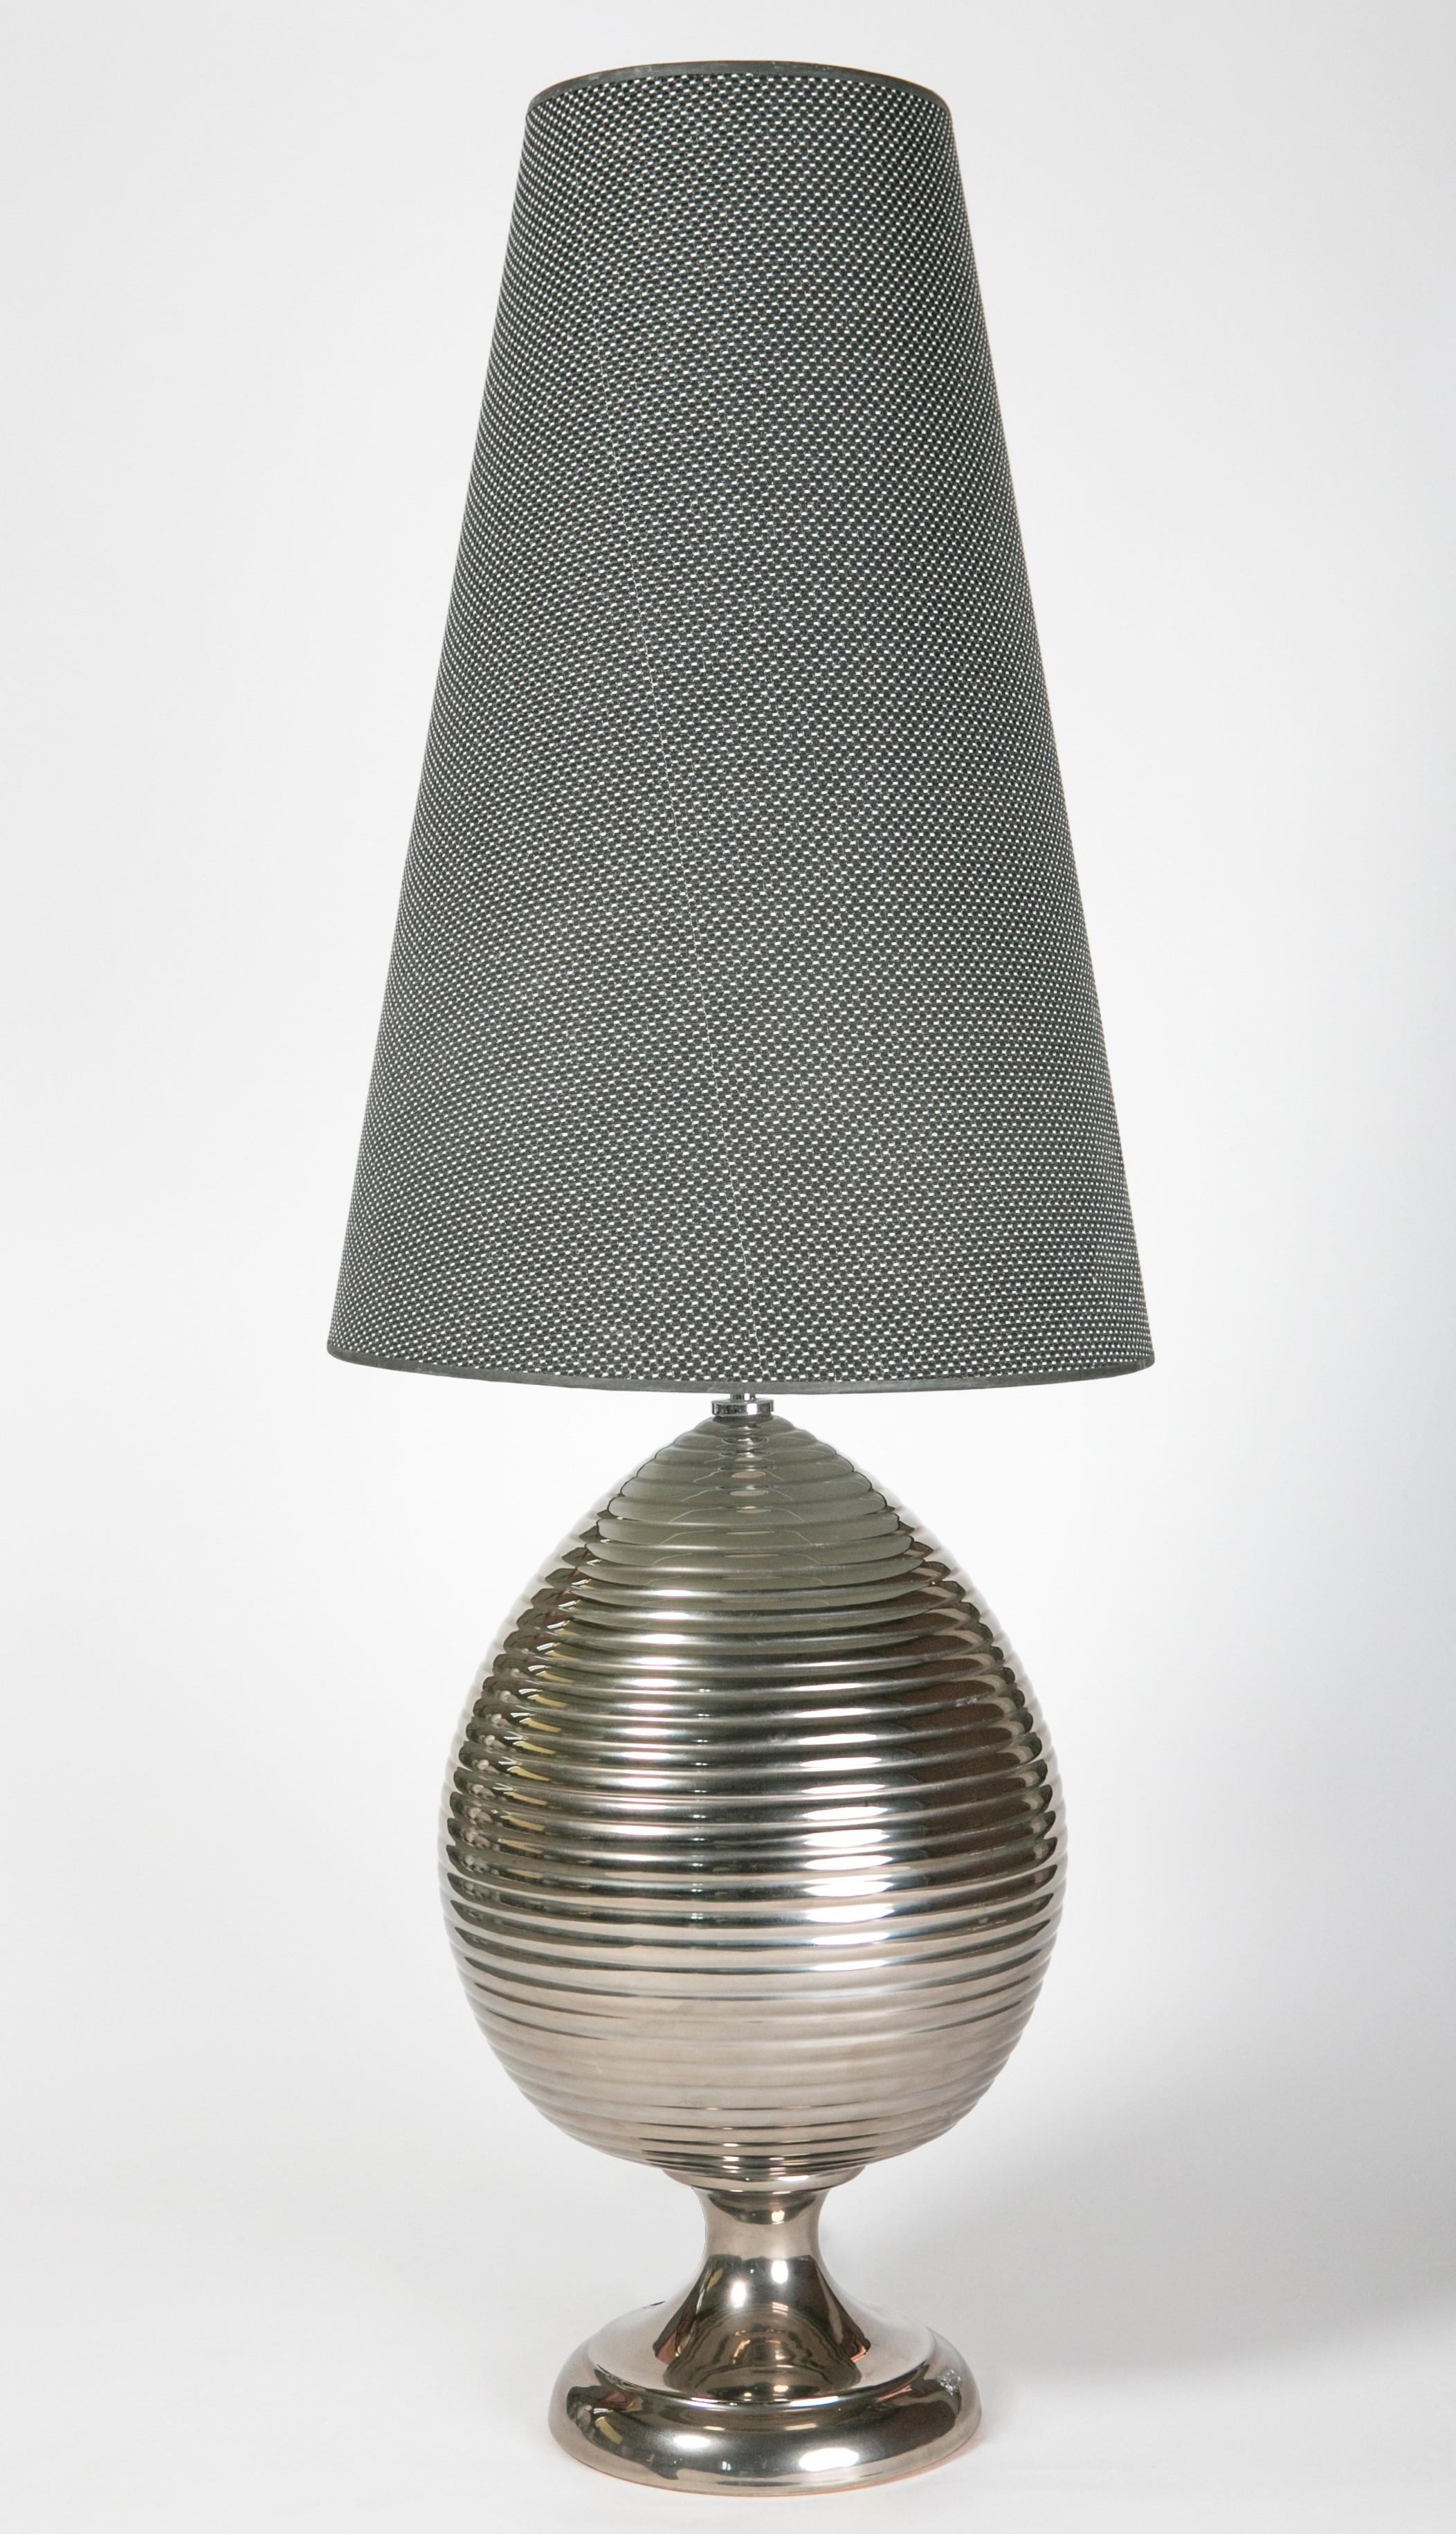 GdS - Enza Fasano Platinum Pumo Blossom Lamp edit.jpg